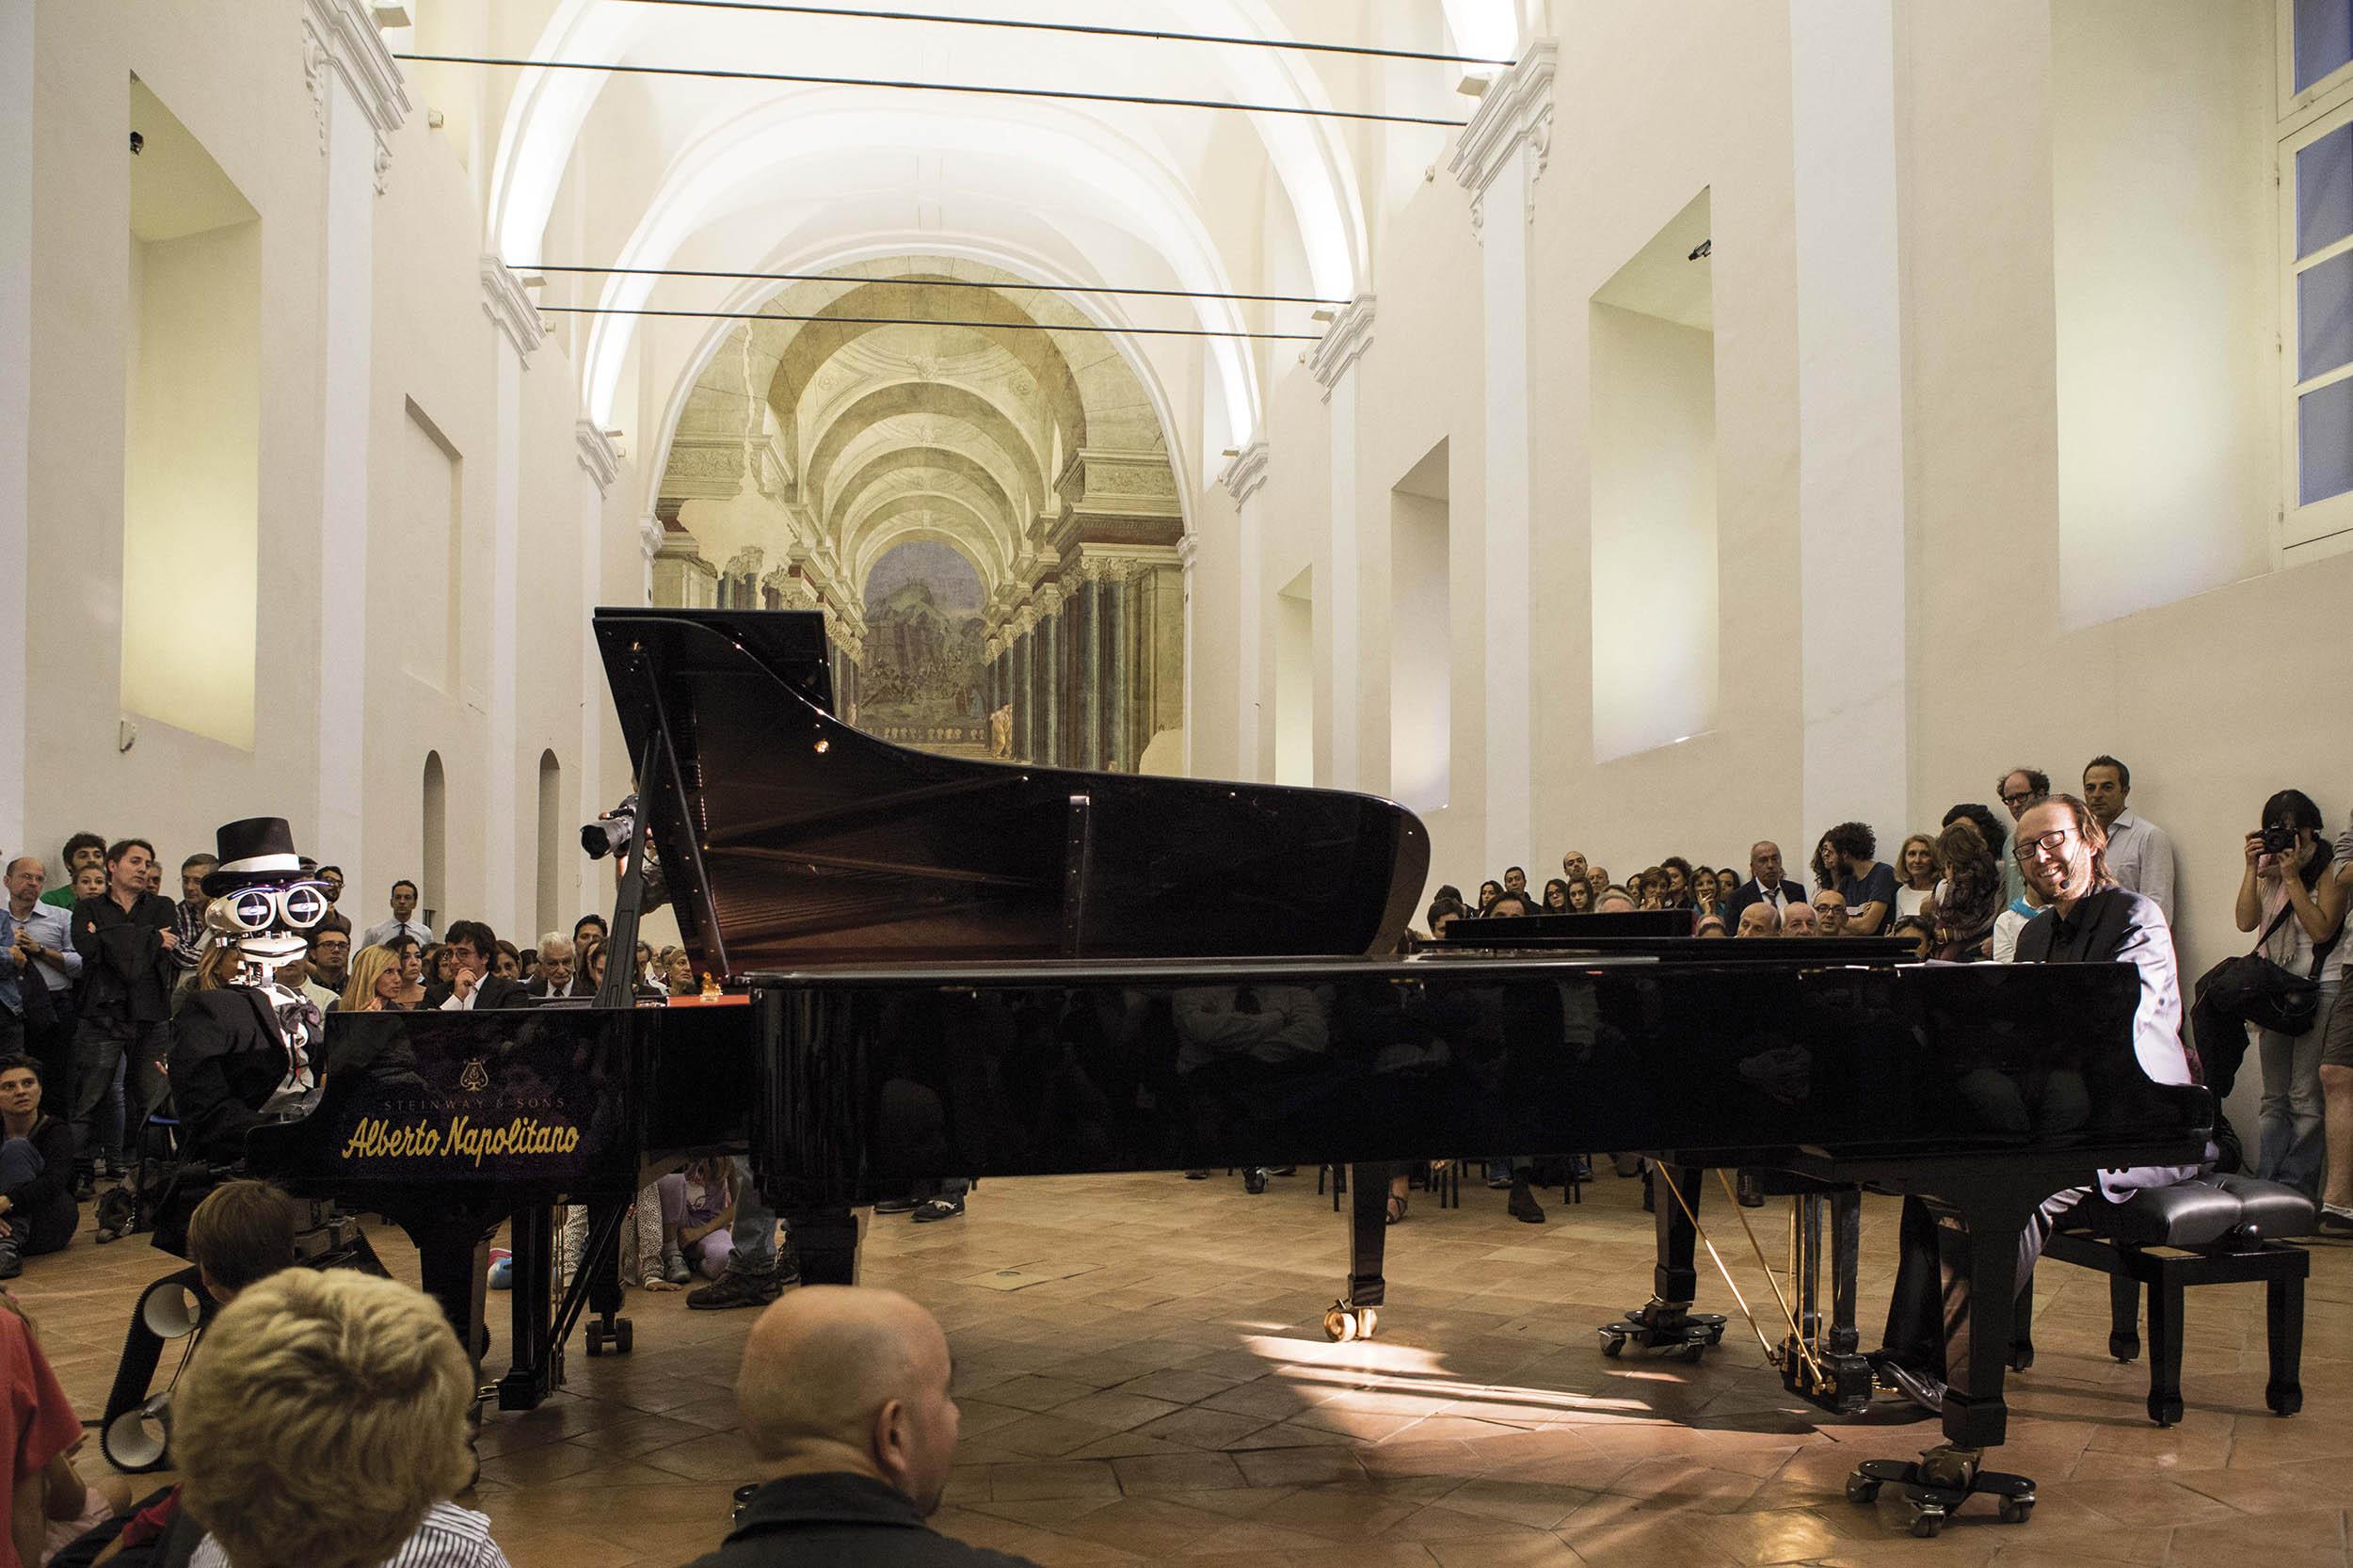 Teotronico a Piano City Napoli 2013